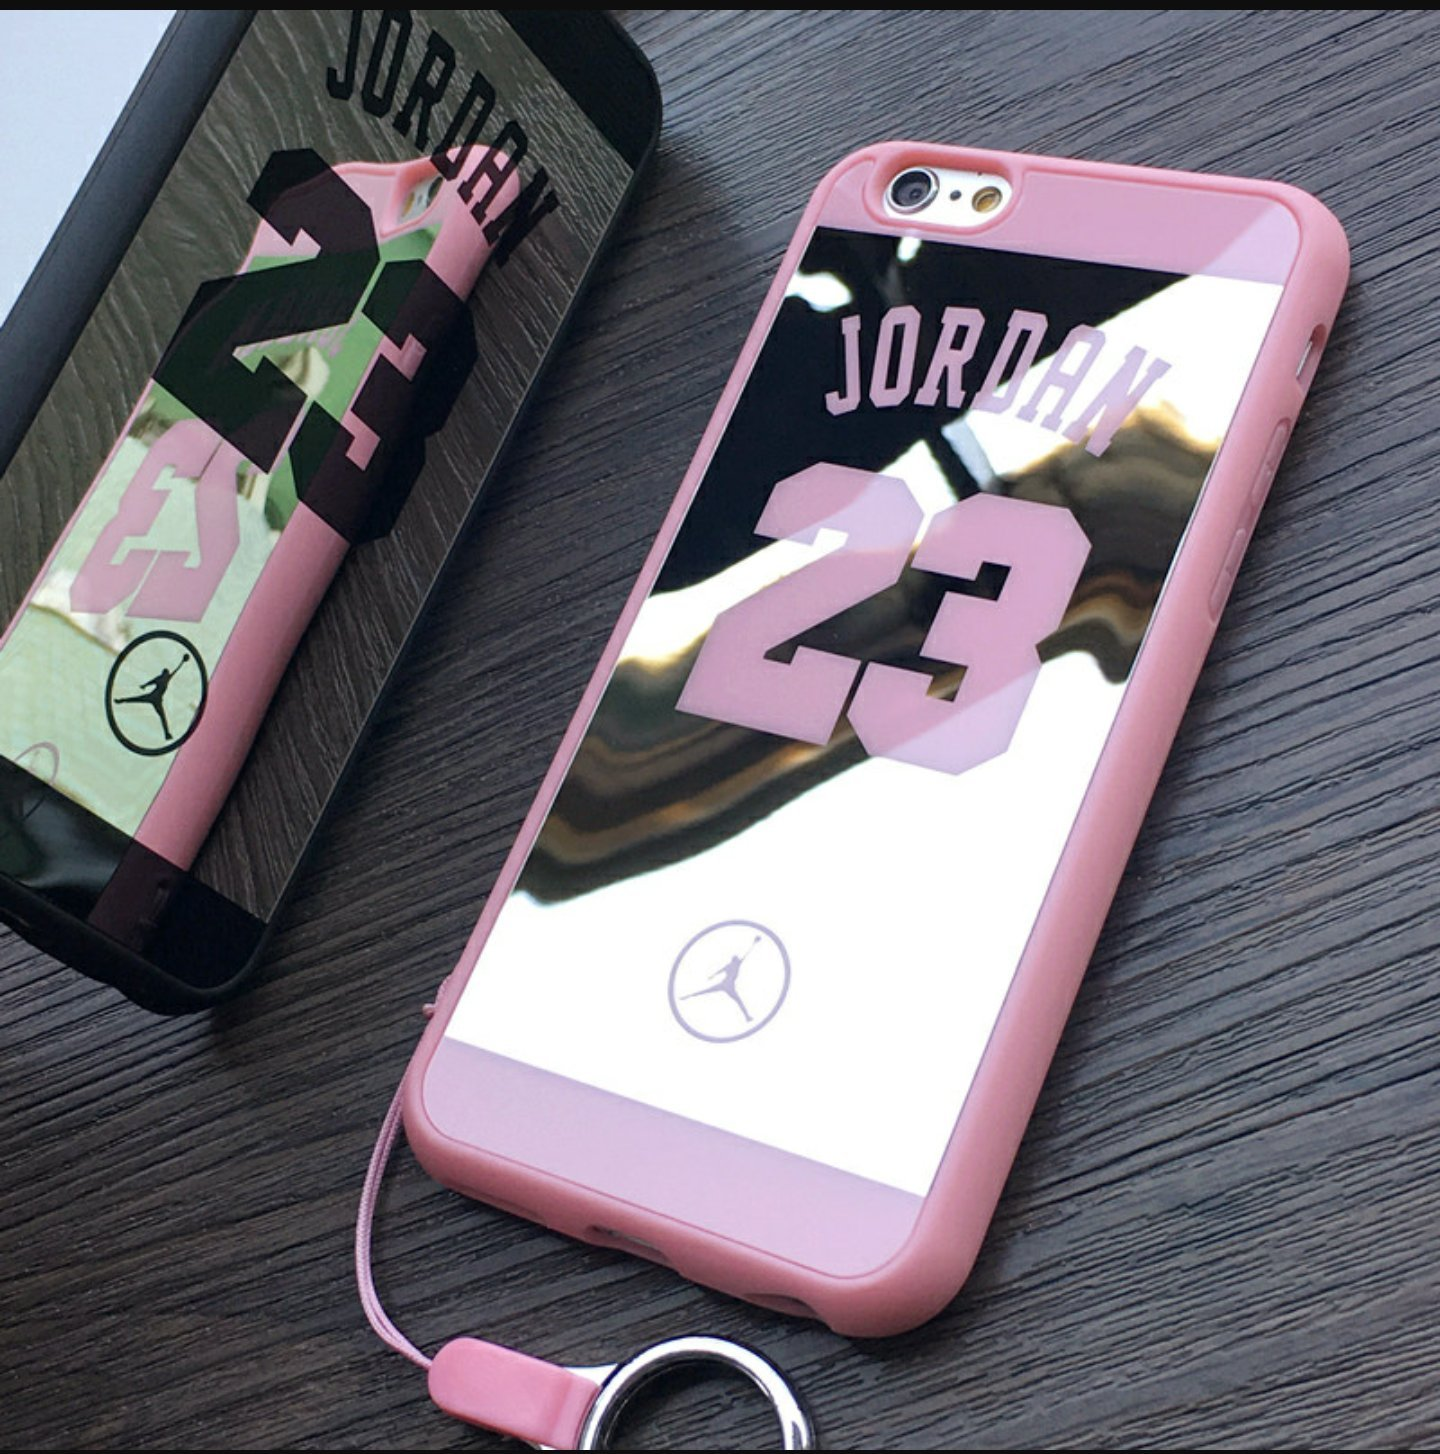 Michael Jordan Case: Amazon.com